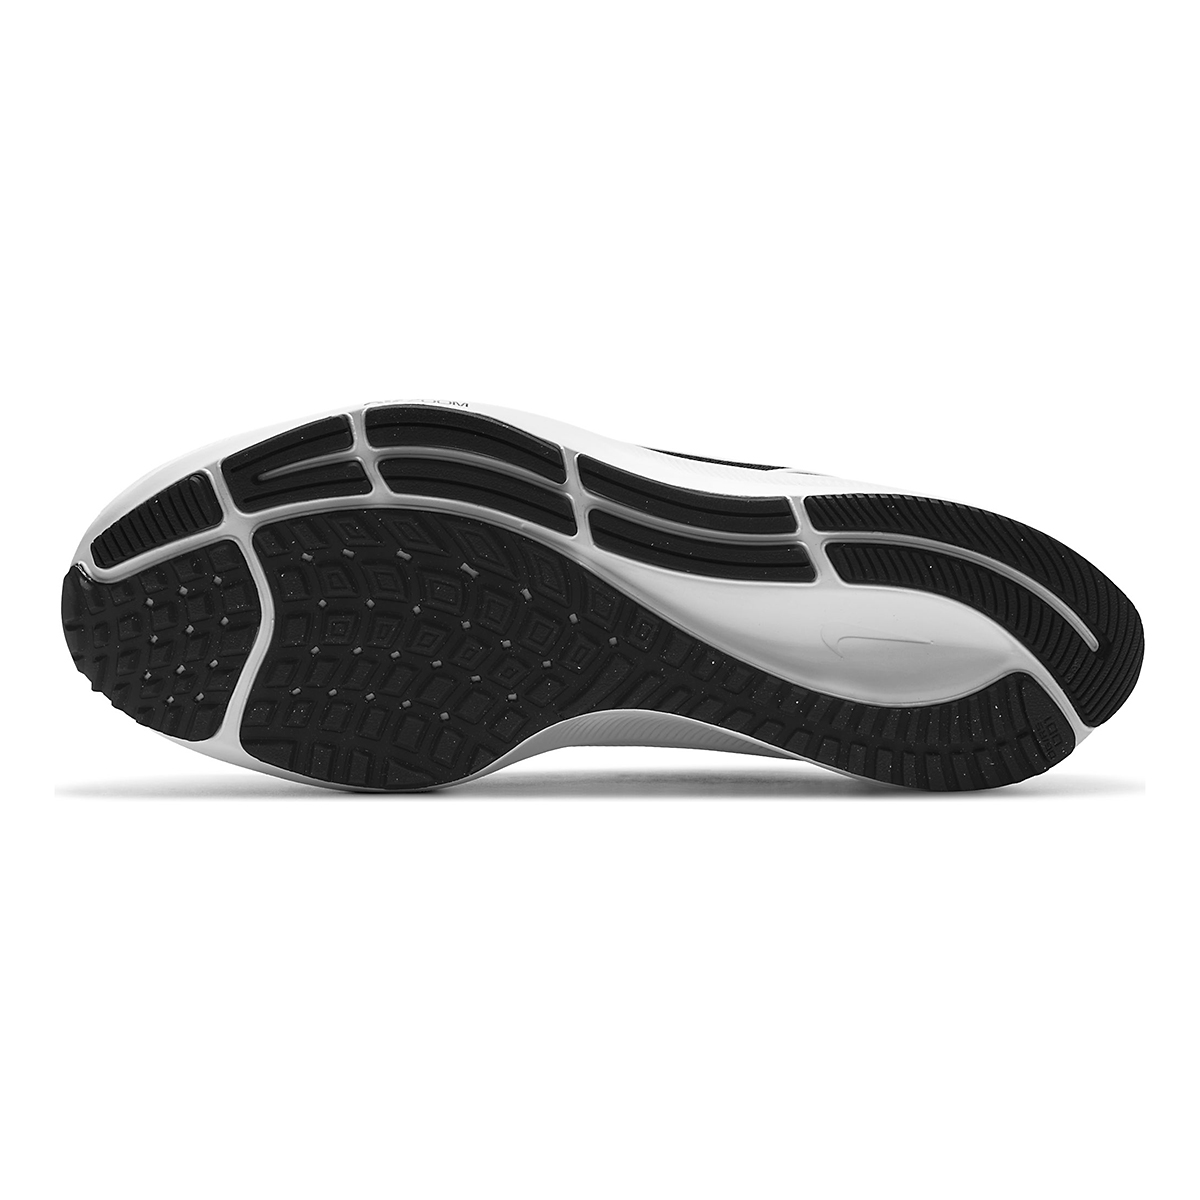 Men's Nike Air Zoom Pegasus 38 Running Shoe - Color: Black/White/Anthracite - Size: 6 - Width: Regular, Black/White/Anthracite, large, image 7